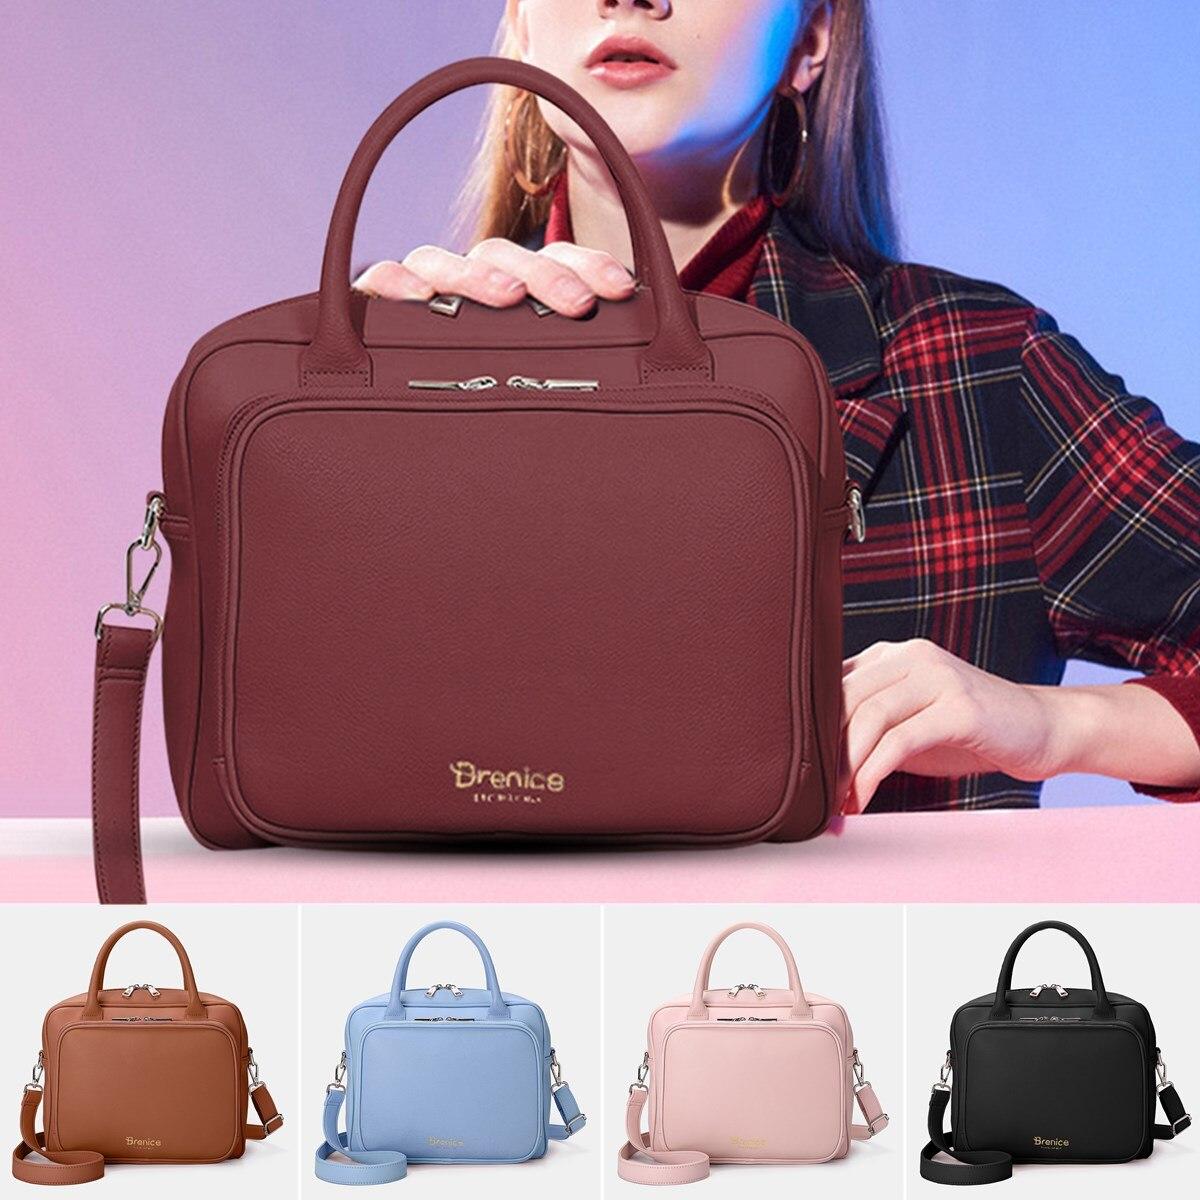 New Women Handbag Fashion Women Hand Bag Female Organize Bag Leather Multifunction Shoulder Bag Crossbody Bag Feminine Bolsa